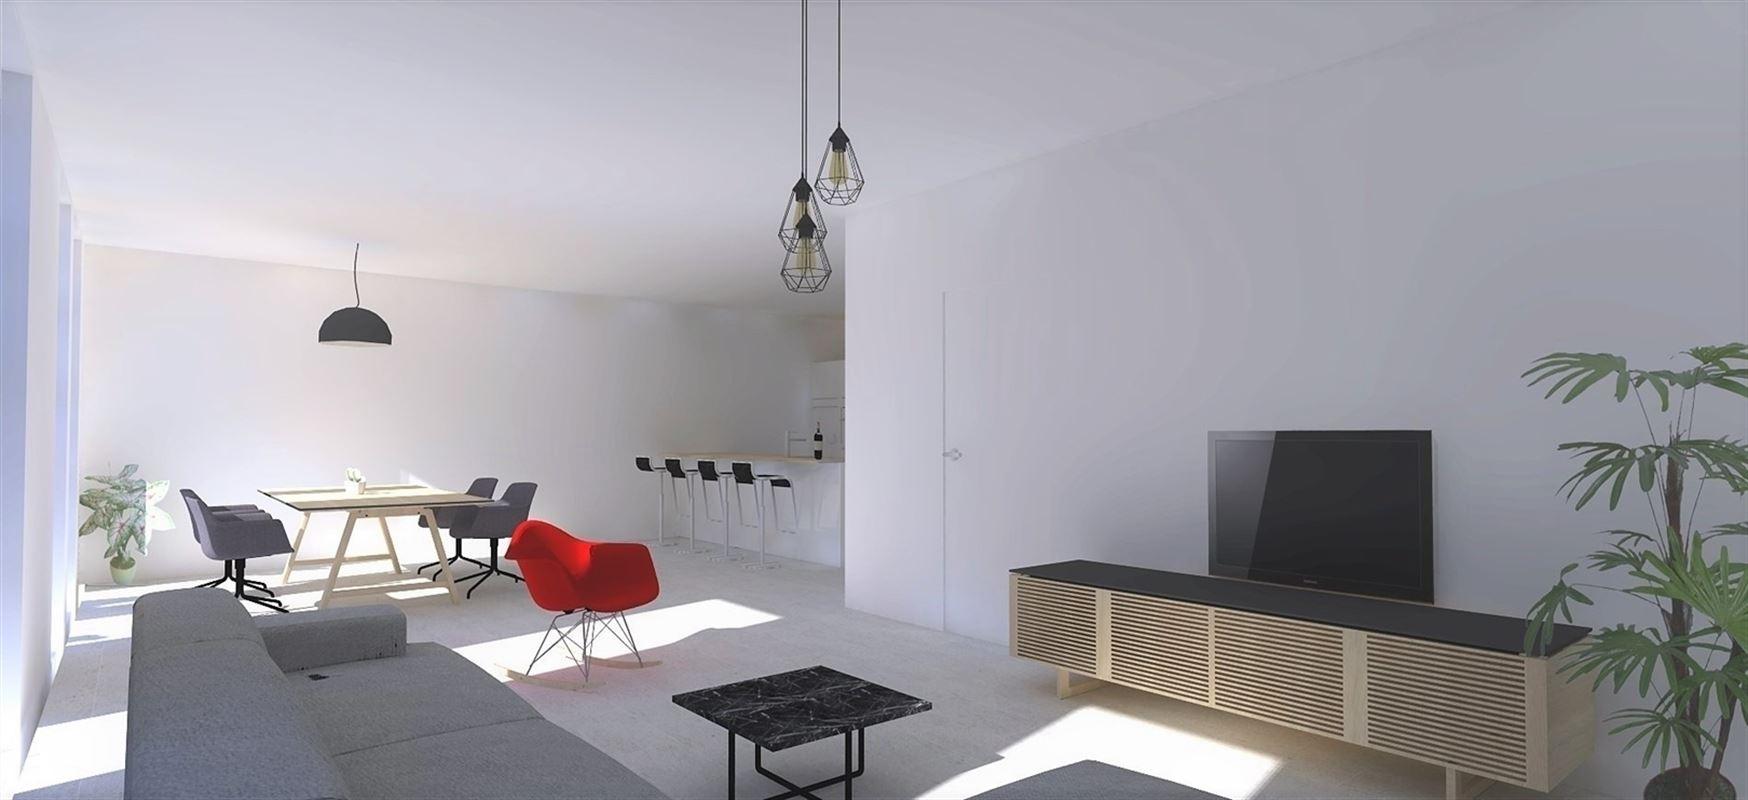 Foto 2 : Appartement te 3960 BREE (België) - Prijs € 226.800